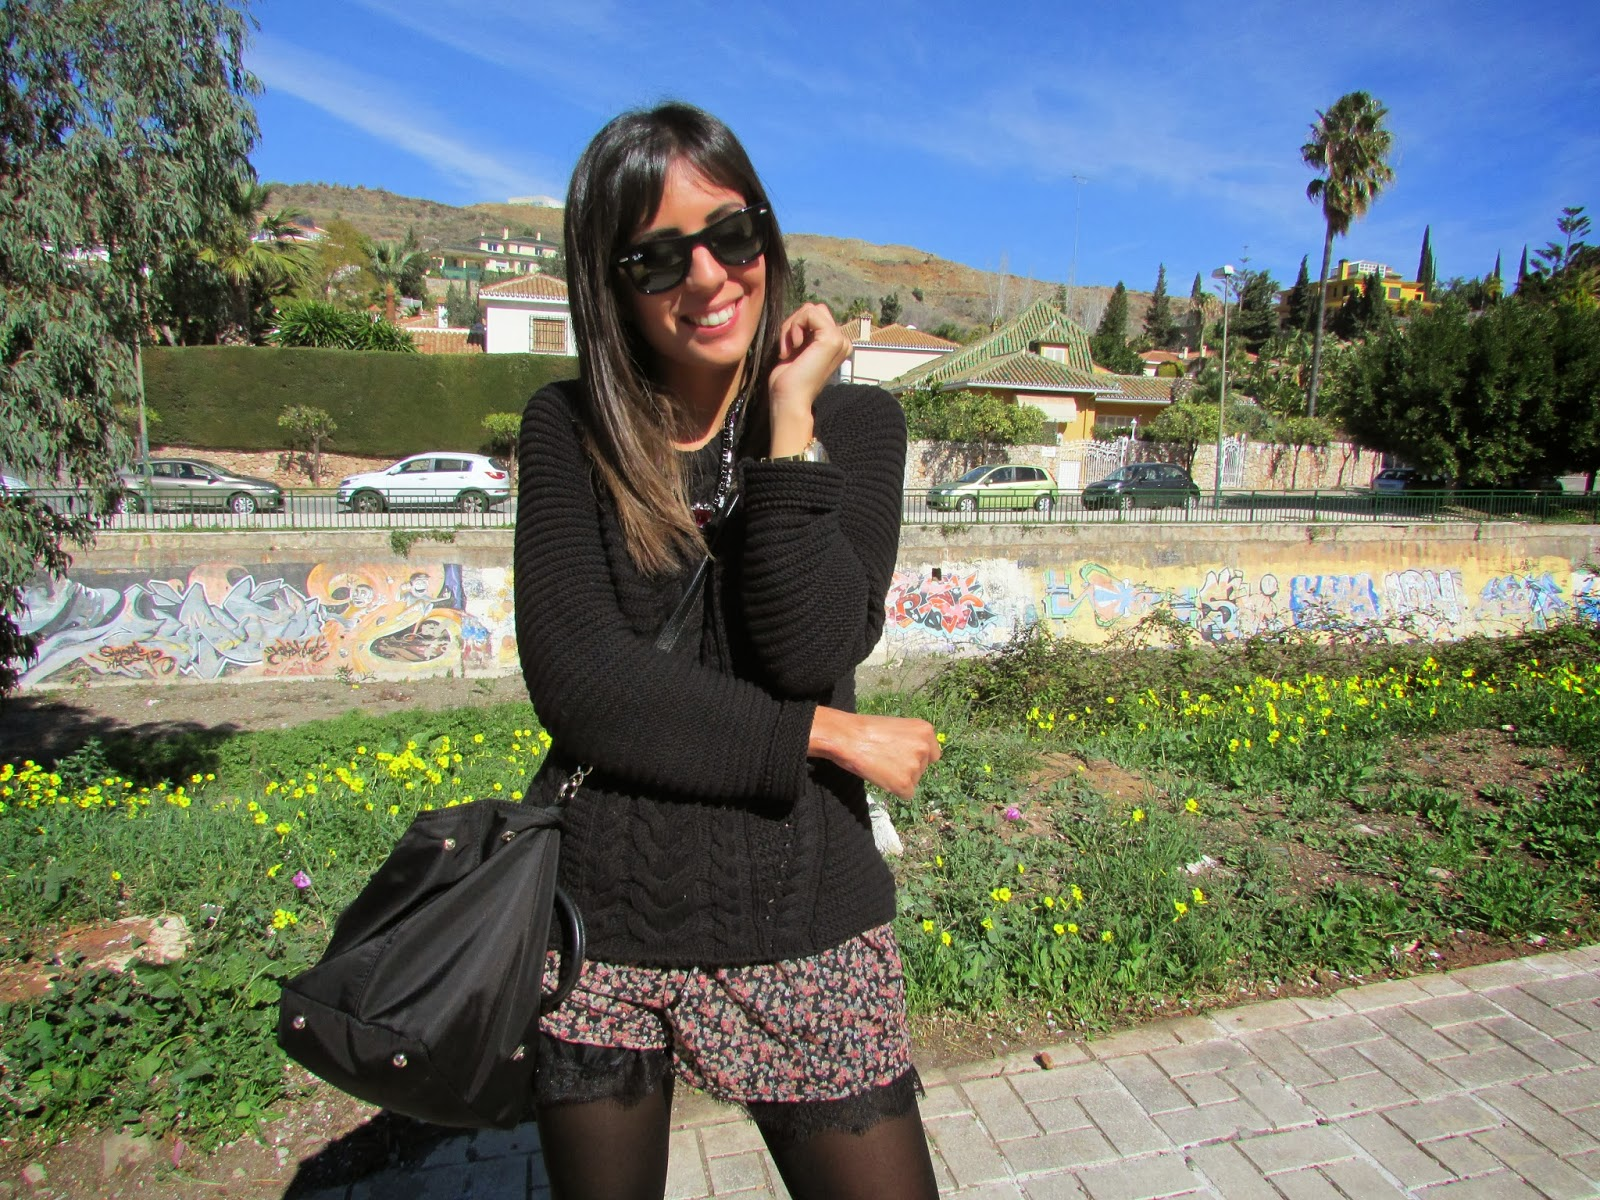 street style cristina style fashion blogger malaga blogger malagueña outfit look ootd tendencias moda inspiration